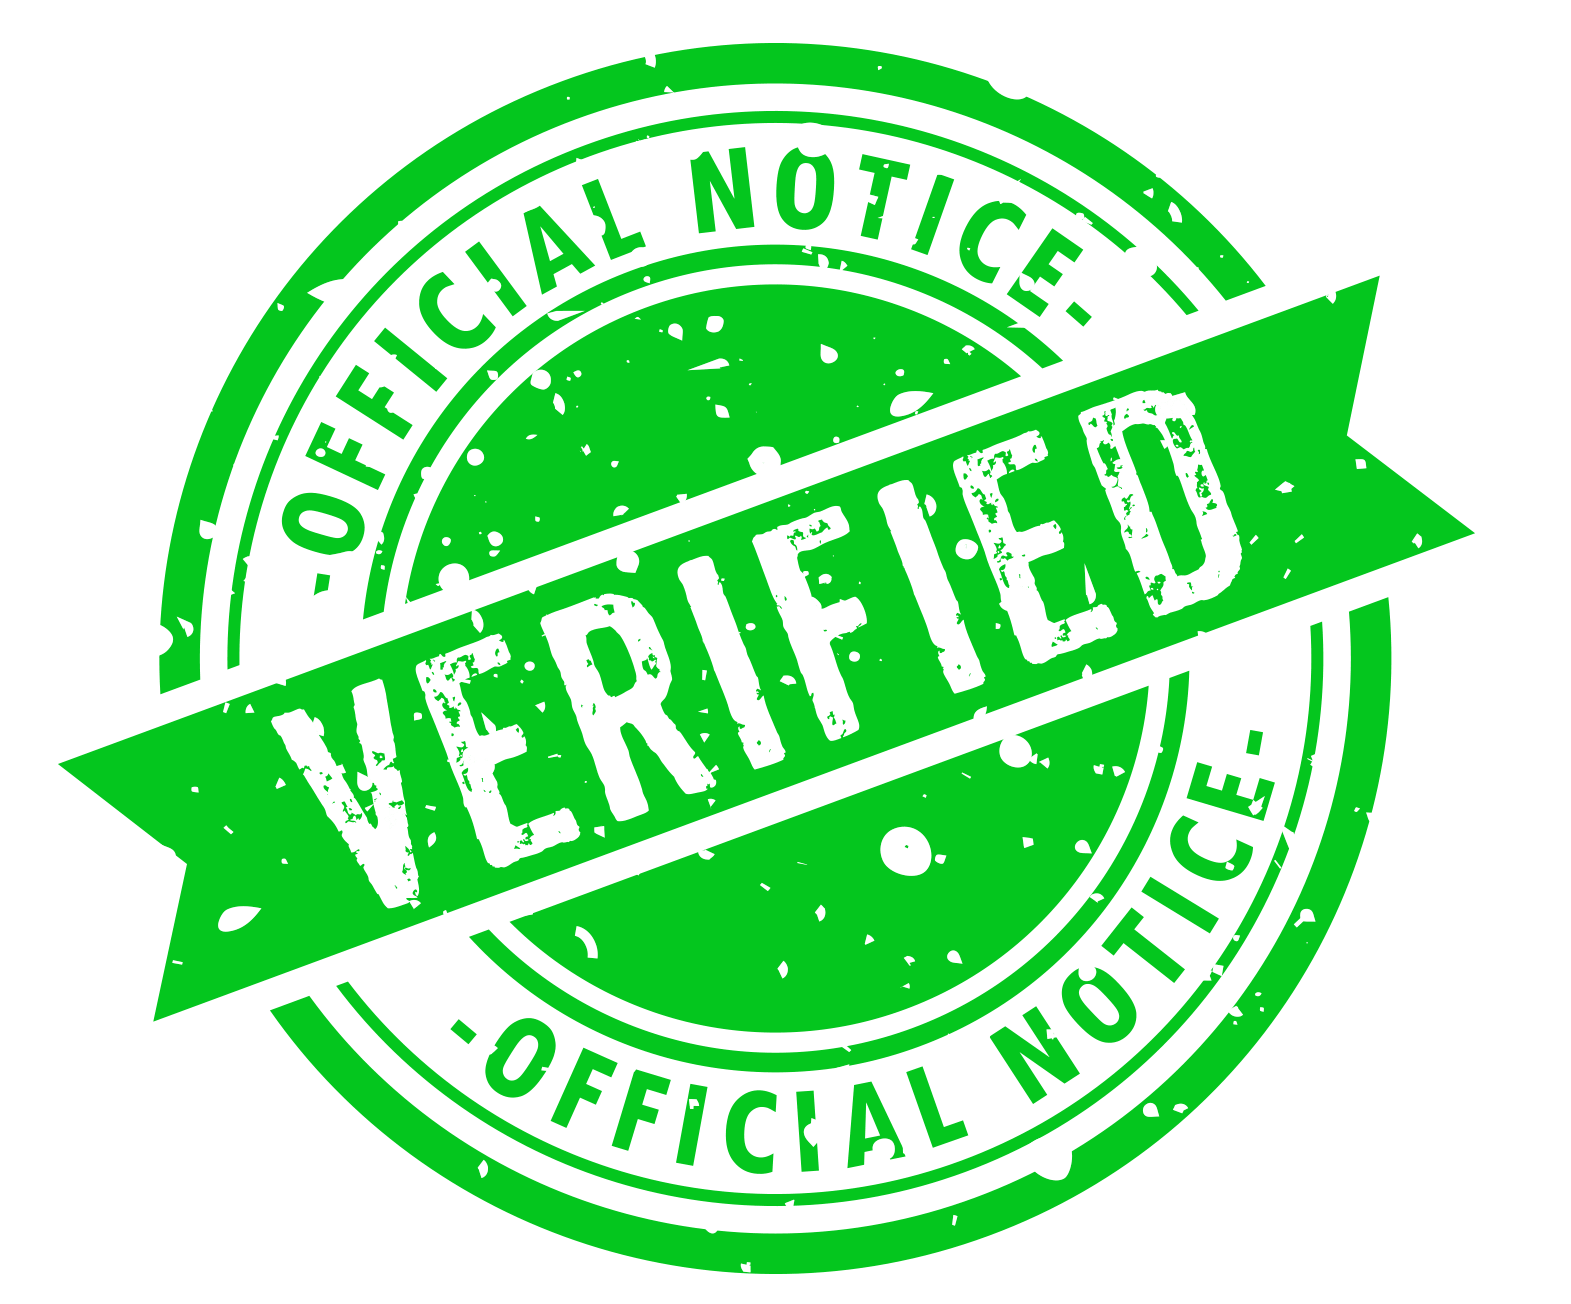 US Electrical Contractors Seal